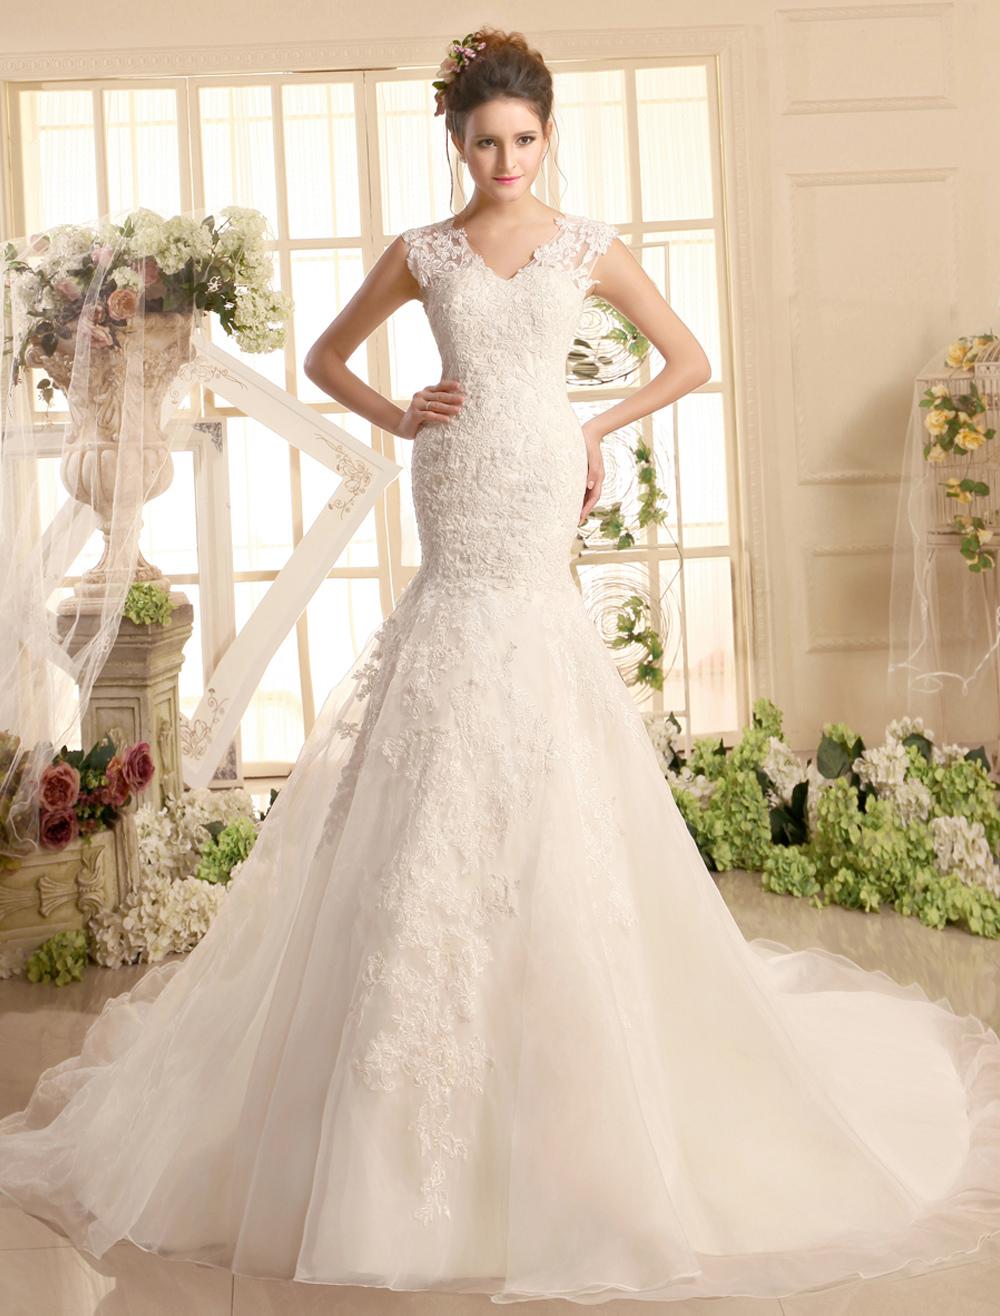 Wedding Dresses Lace V Neck Mermaid Bridal Dress Ivory Illusion Organza Wedding Gown